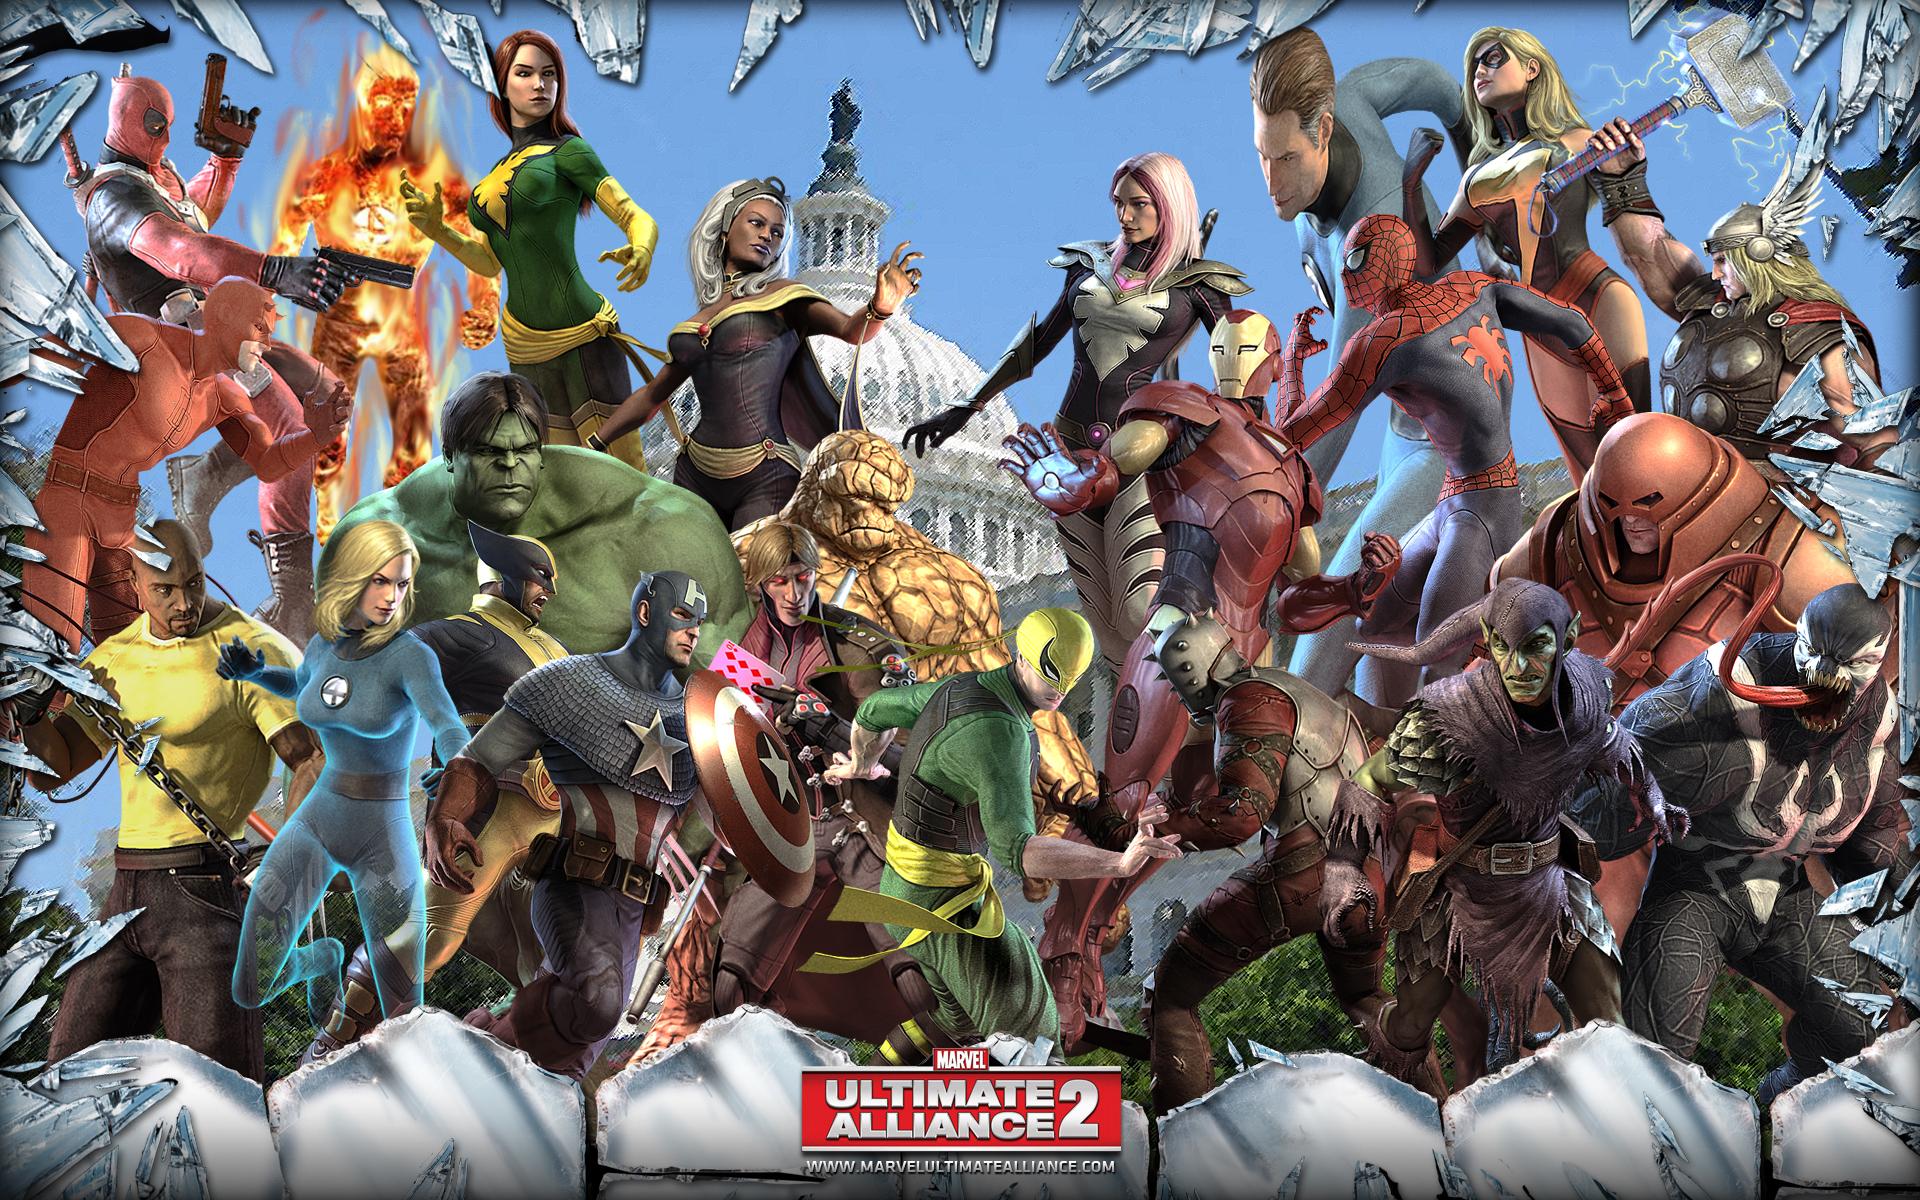 wallpaper, alliance, ultimate, video, games, desktop, marvel, awesome